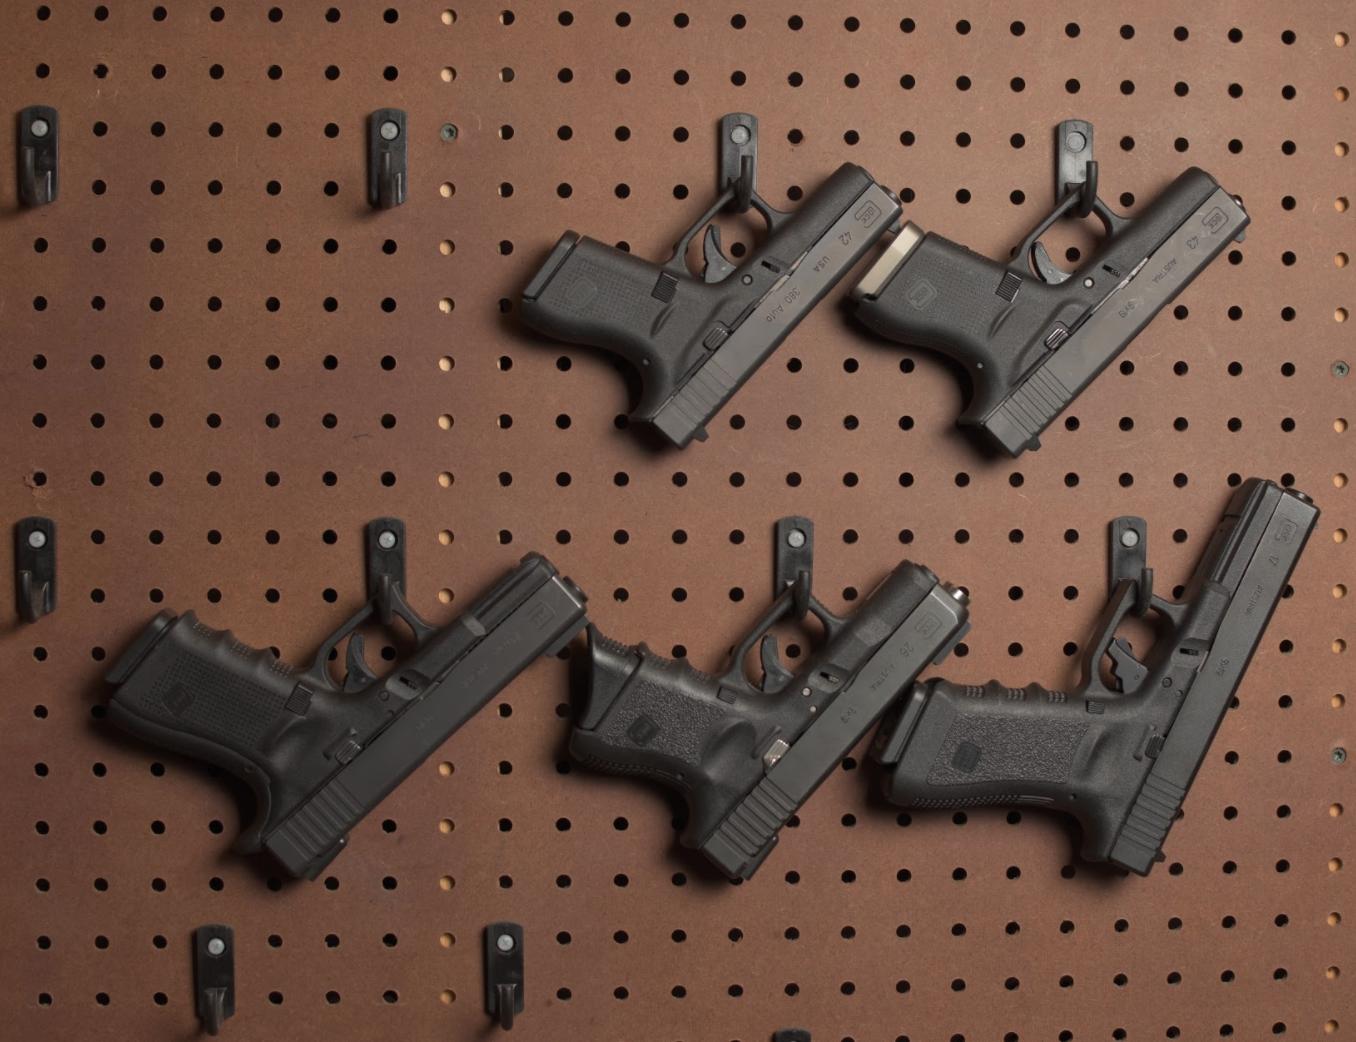 Glock, pistols, G19, G43, G17, G26, Glock firearms, CrossBreed Holsters, glock models, glock categories, CCW, concealed carry, IWB, OWB, best glock, glock for, G42, Glock chart, Glock models,